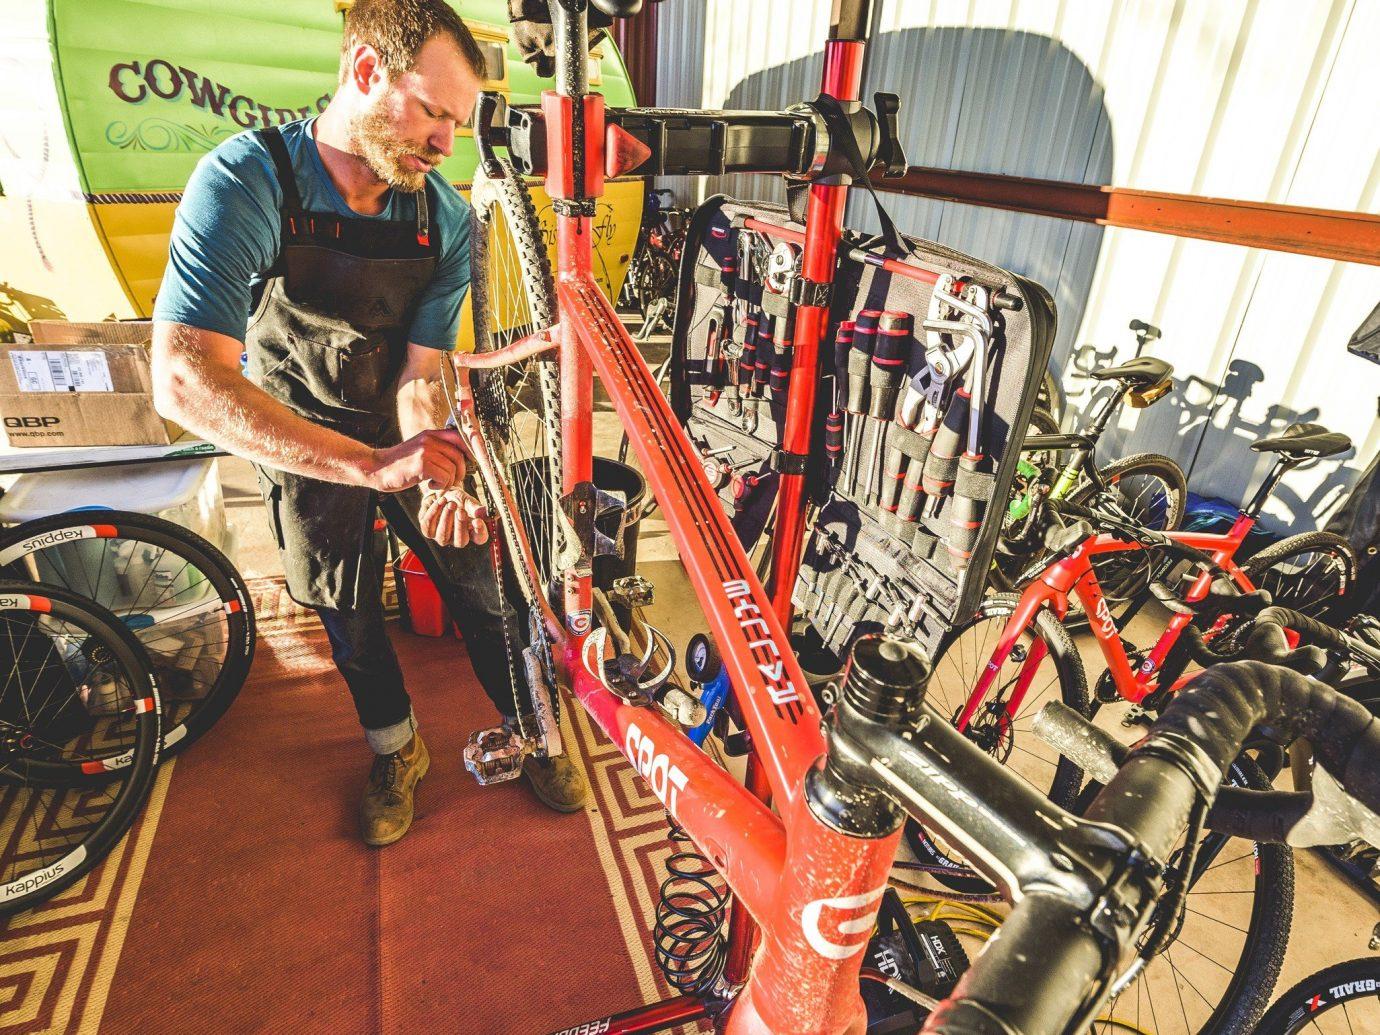 Health + Wellness Meditation Retreats Trip Ideas Yoga Retreats indoor bicycle structure vehicle sport venue machine